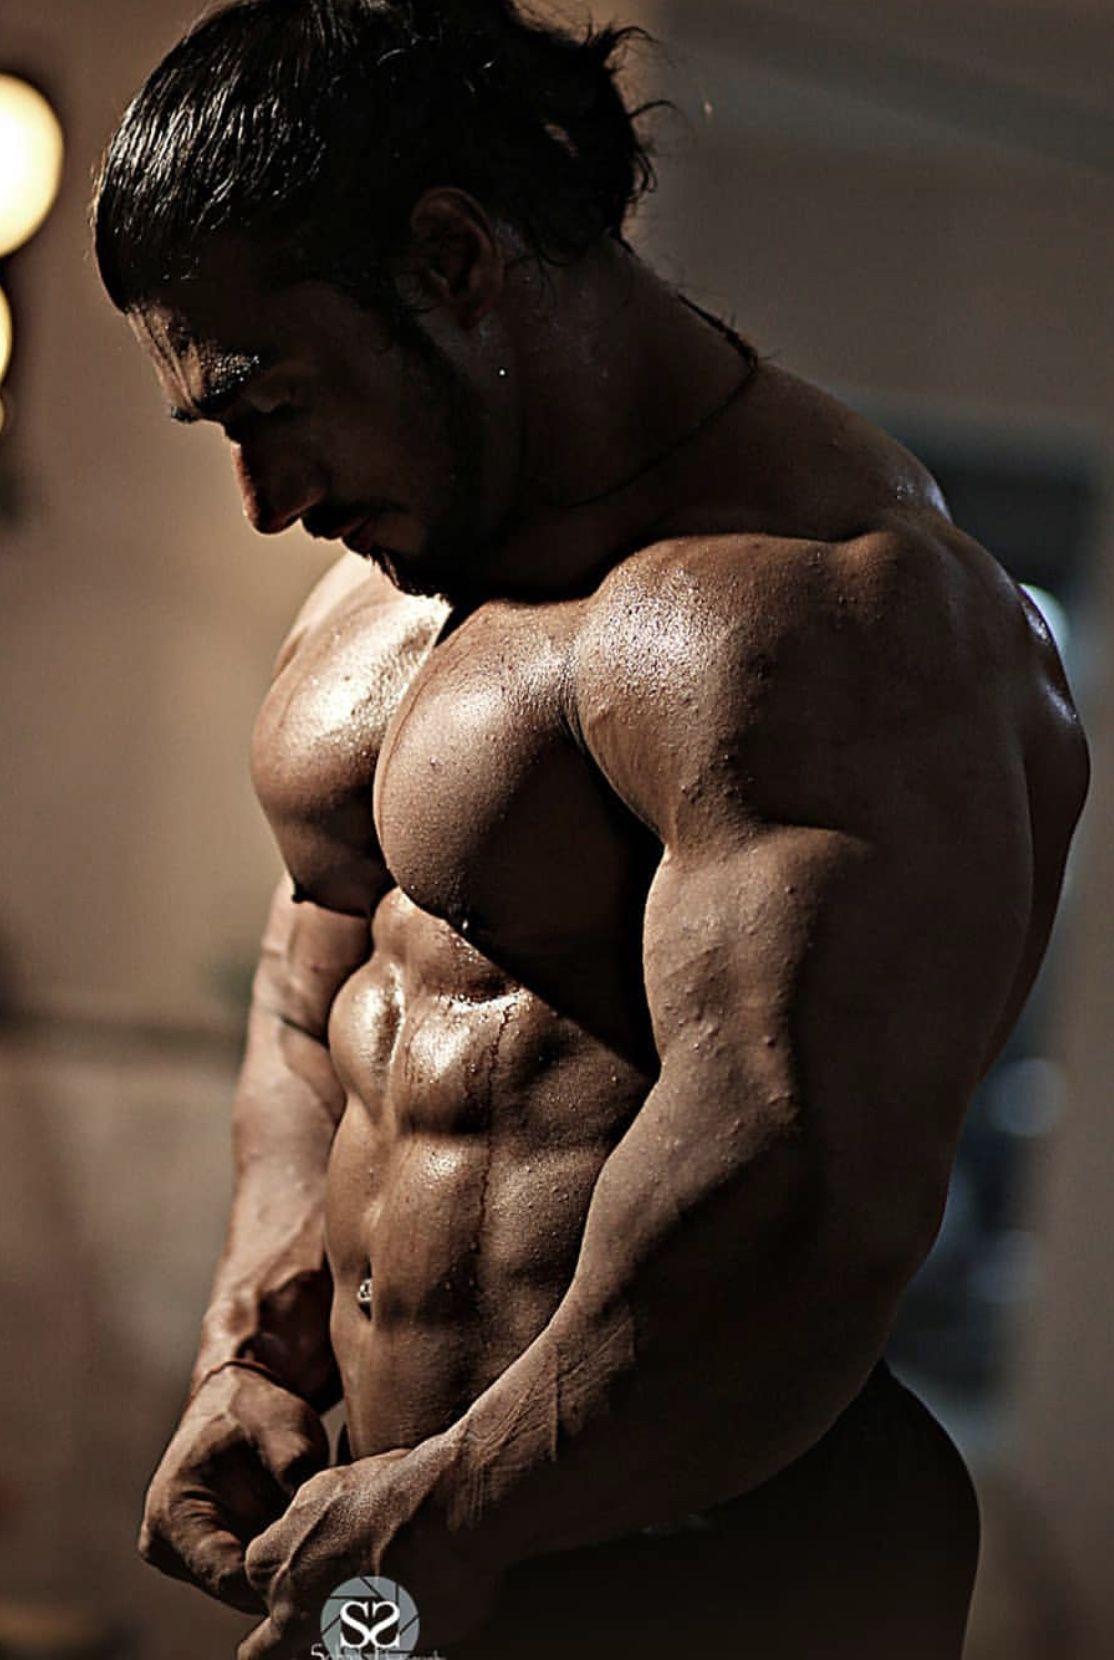 Pin by muscle fan in philly on indian bodybuilders in 2020